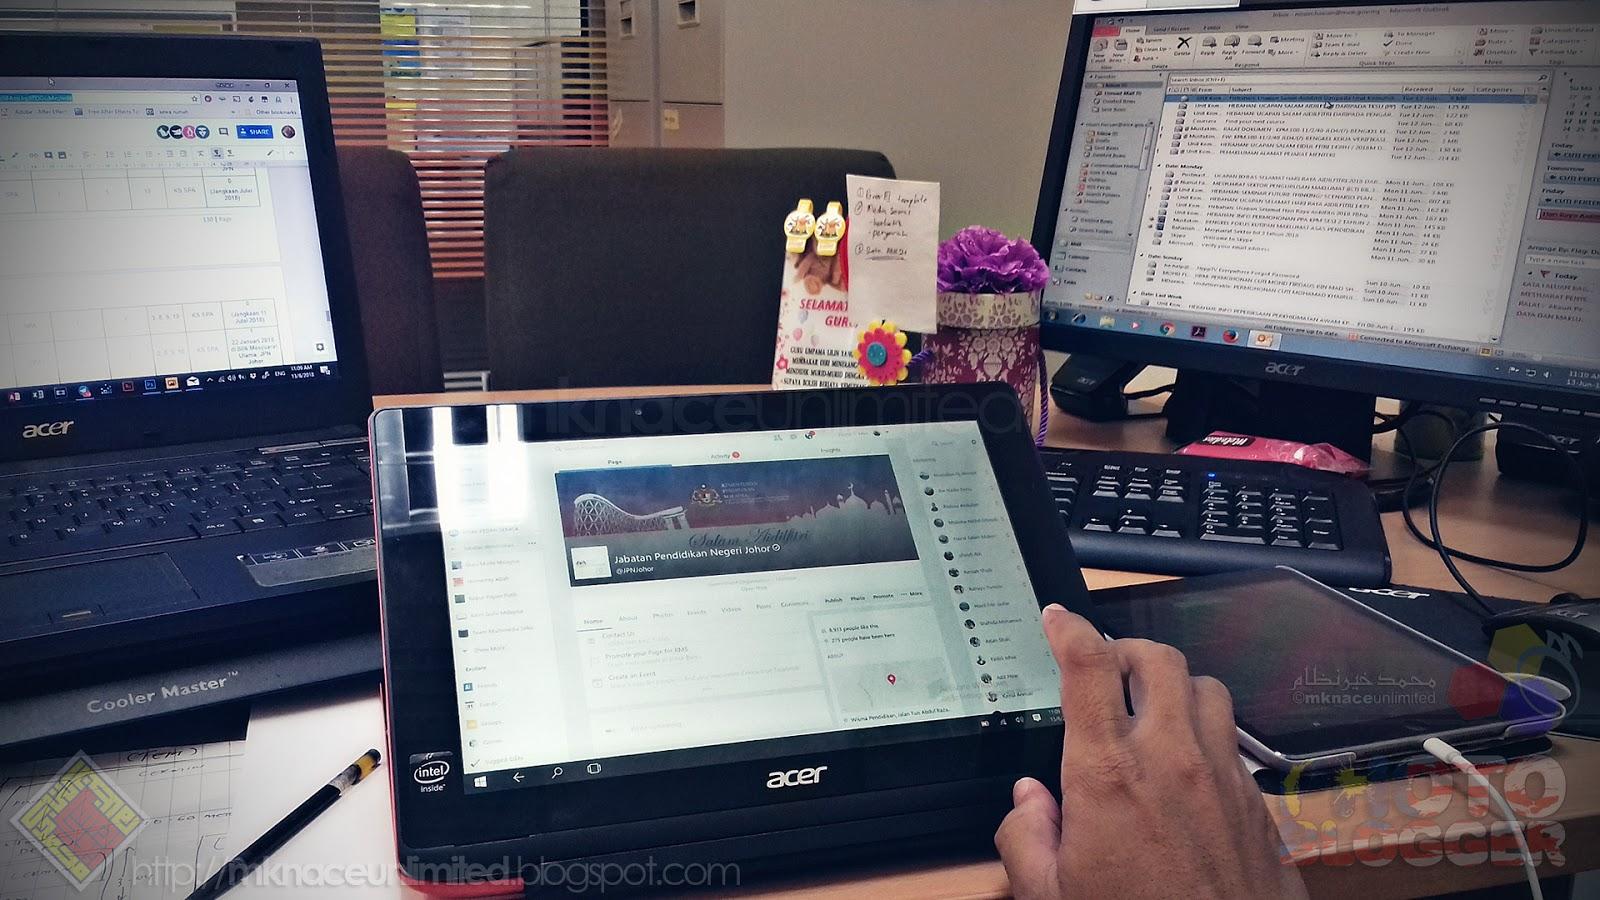 My another project. Semalam. Sesambil dok lepak lepak wat multitasking  menggila 72f8b01544